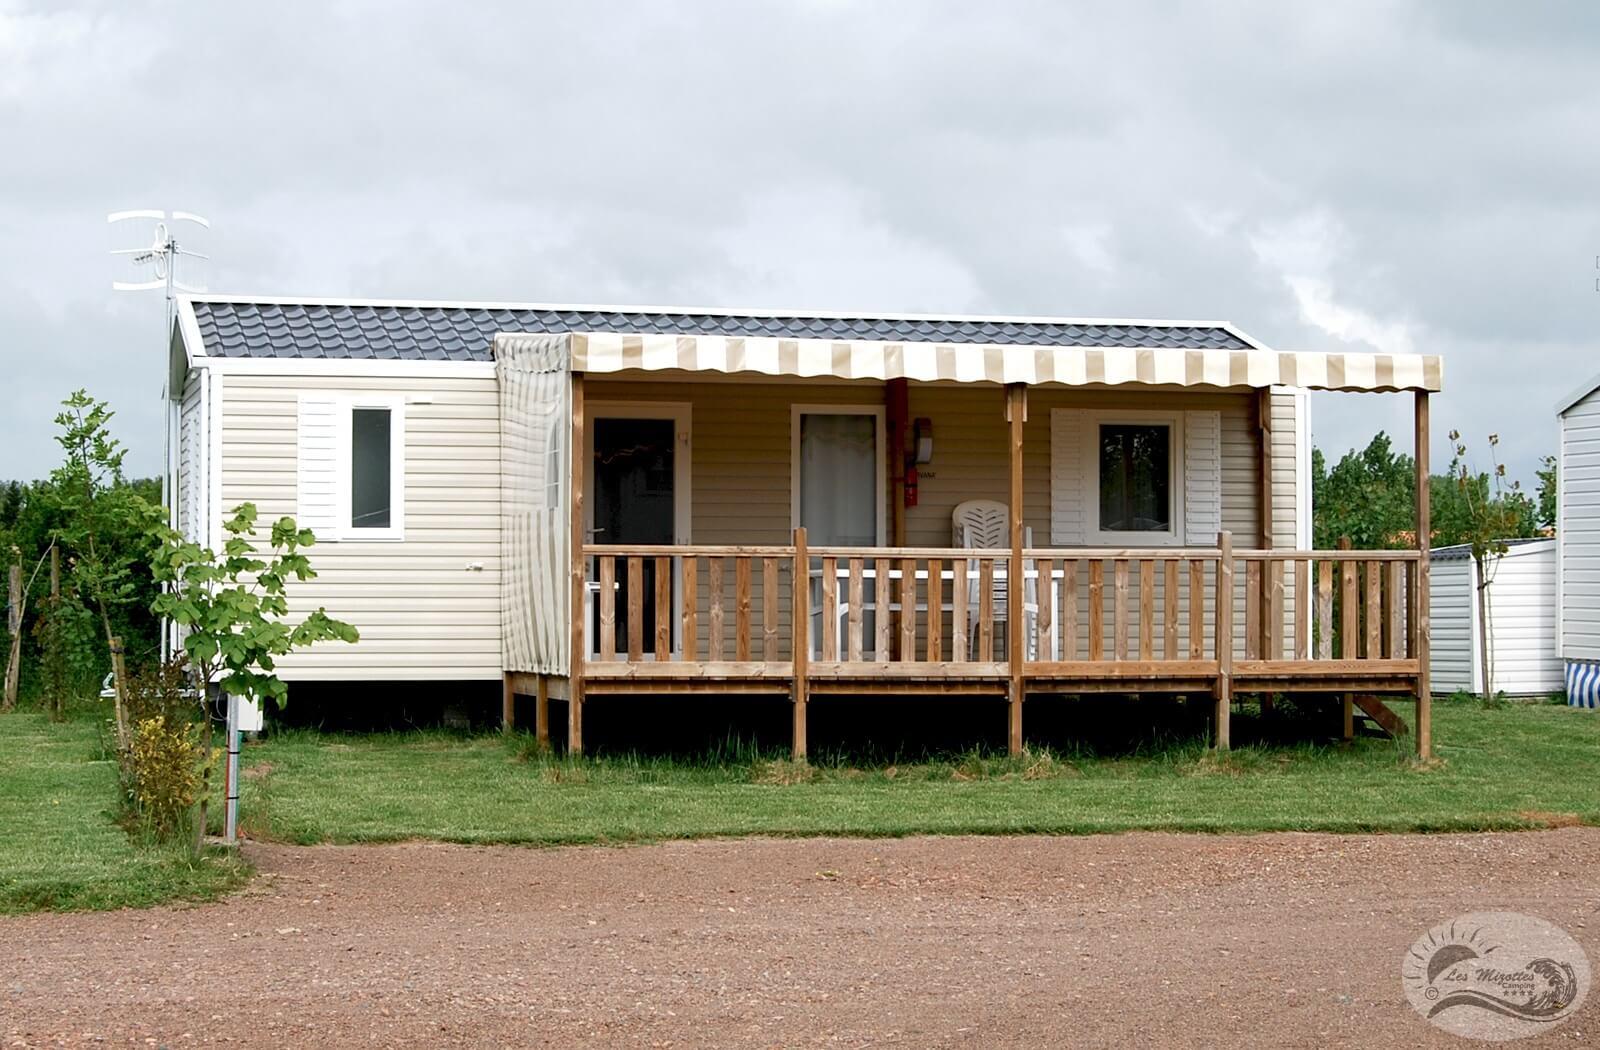 mobil homes 3 chambres vip location 6 8 personnes camping les mizottes. Black Bedroom Furniture Sets. Home Design Ideas